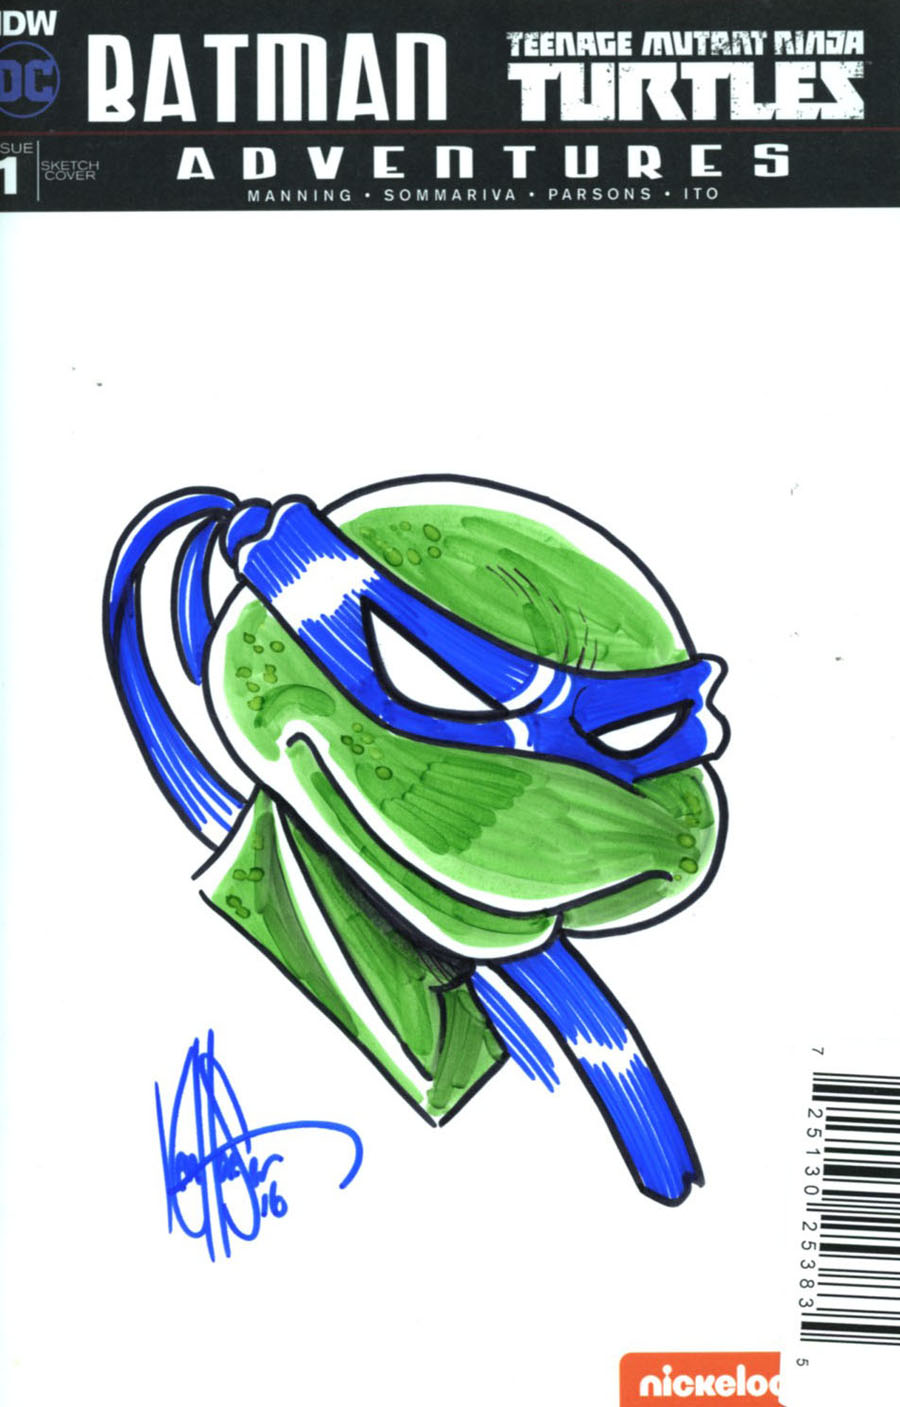 Batman Teenage Mutant Ninja Turtles Adventures #1 Cover I DF Blank & Remarked Ken Haeser Turtle Hand-Drawn Sketch Variant Cover